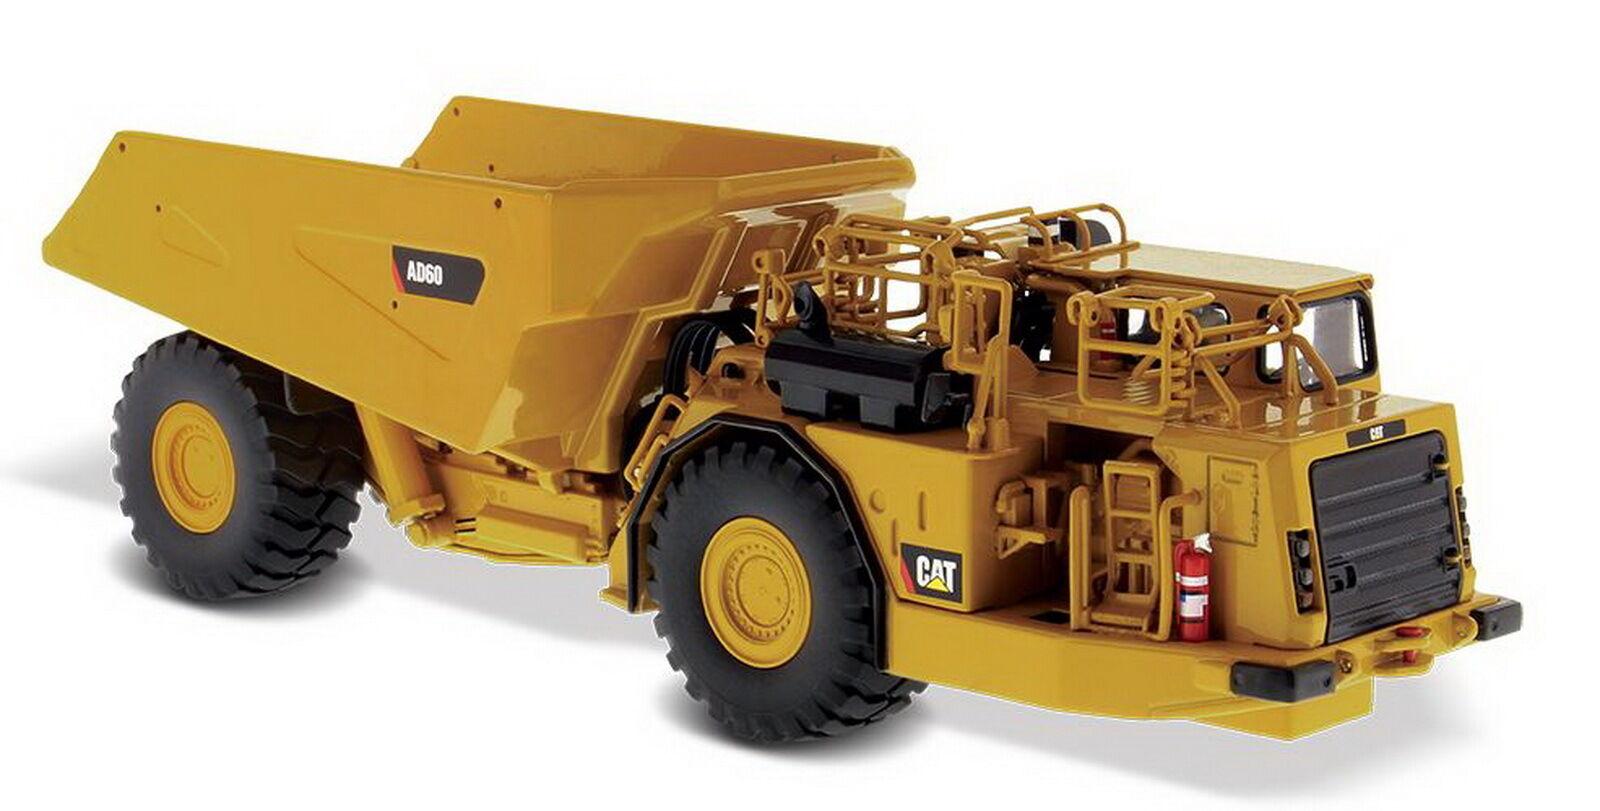 1 50 dm Caterpillar Cat AD60 Modelo Diecast camiones articulados subterráneo  85516